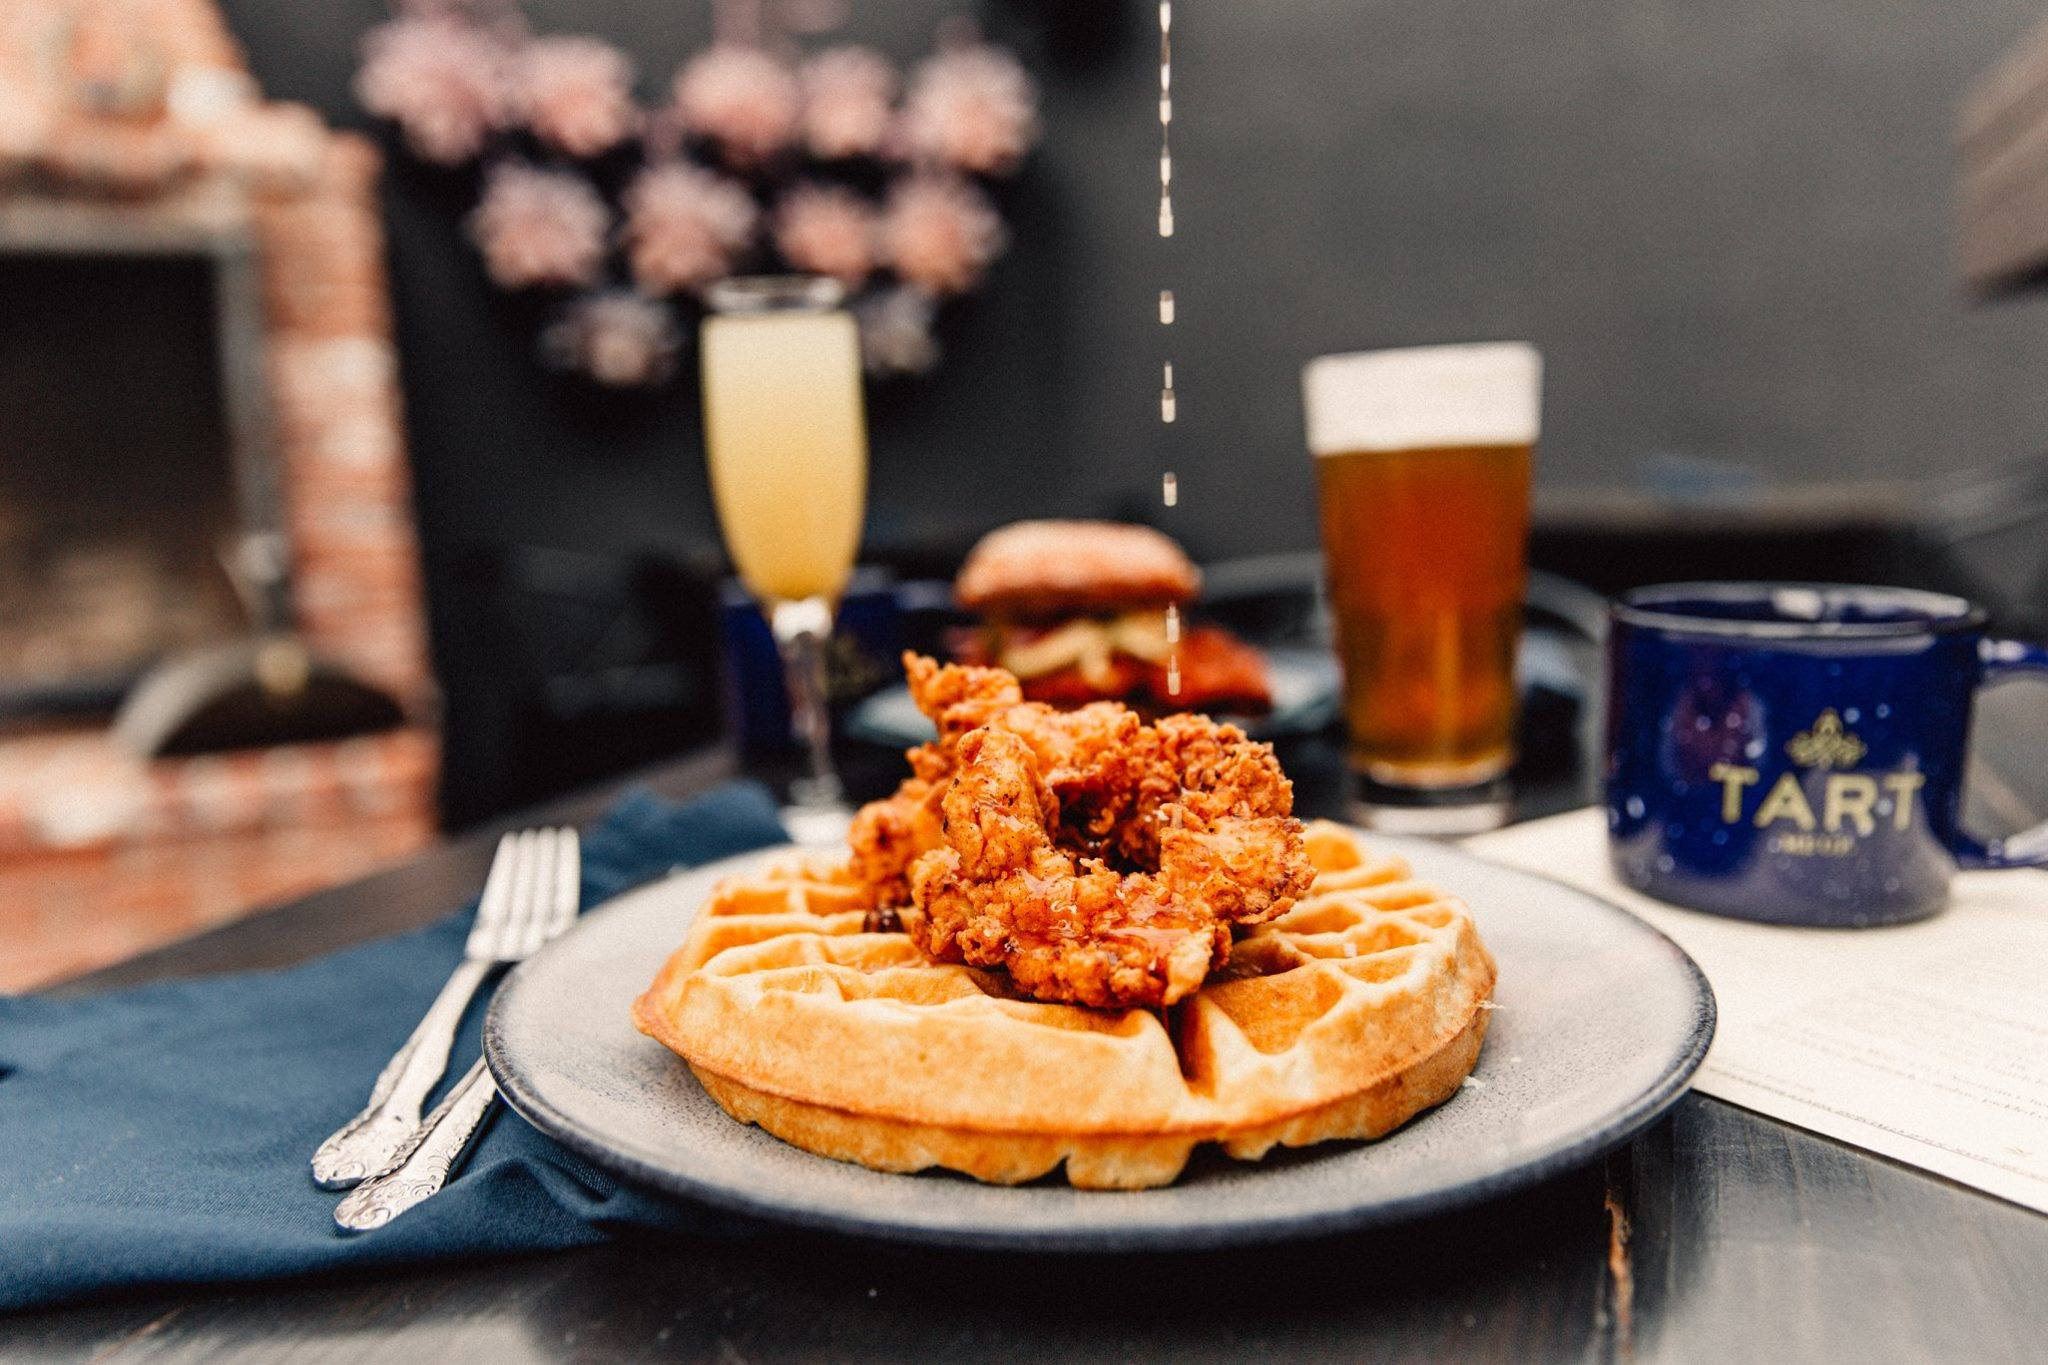 Fried chicken & waffle at Tart Restaurant